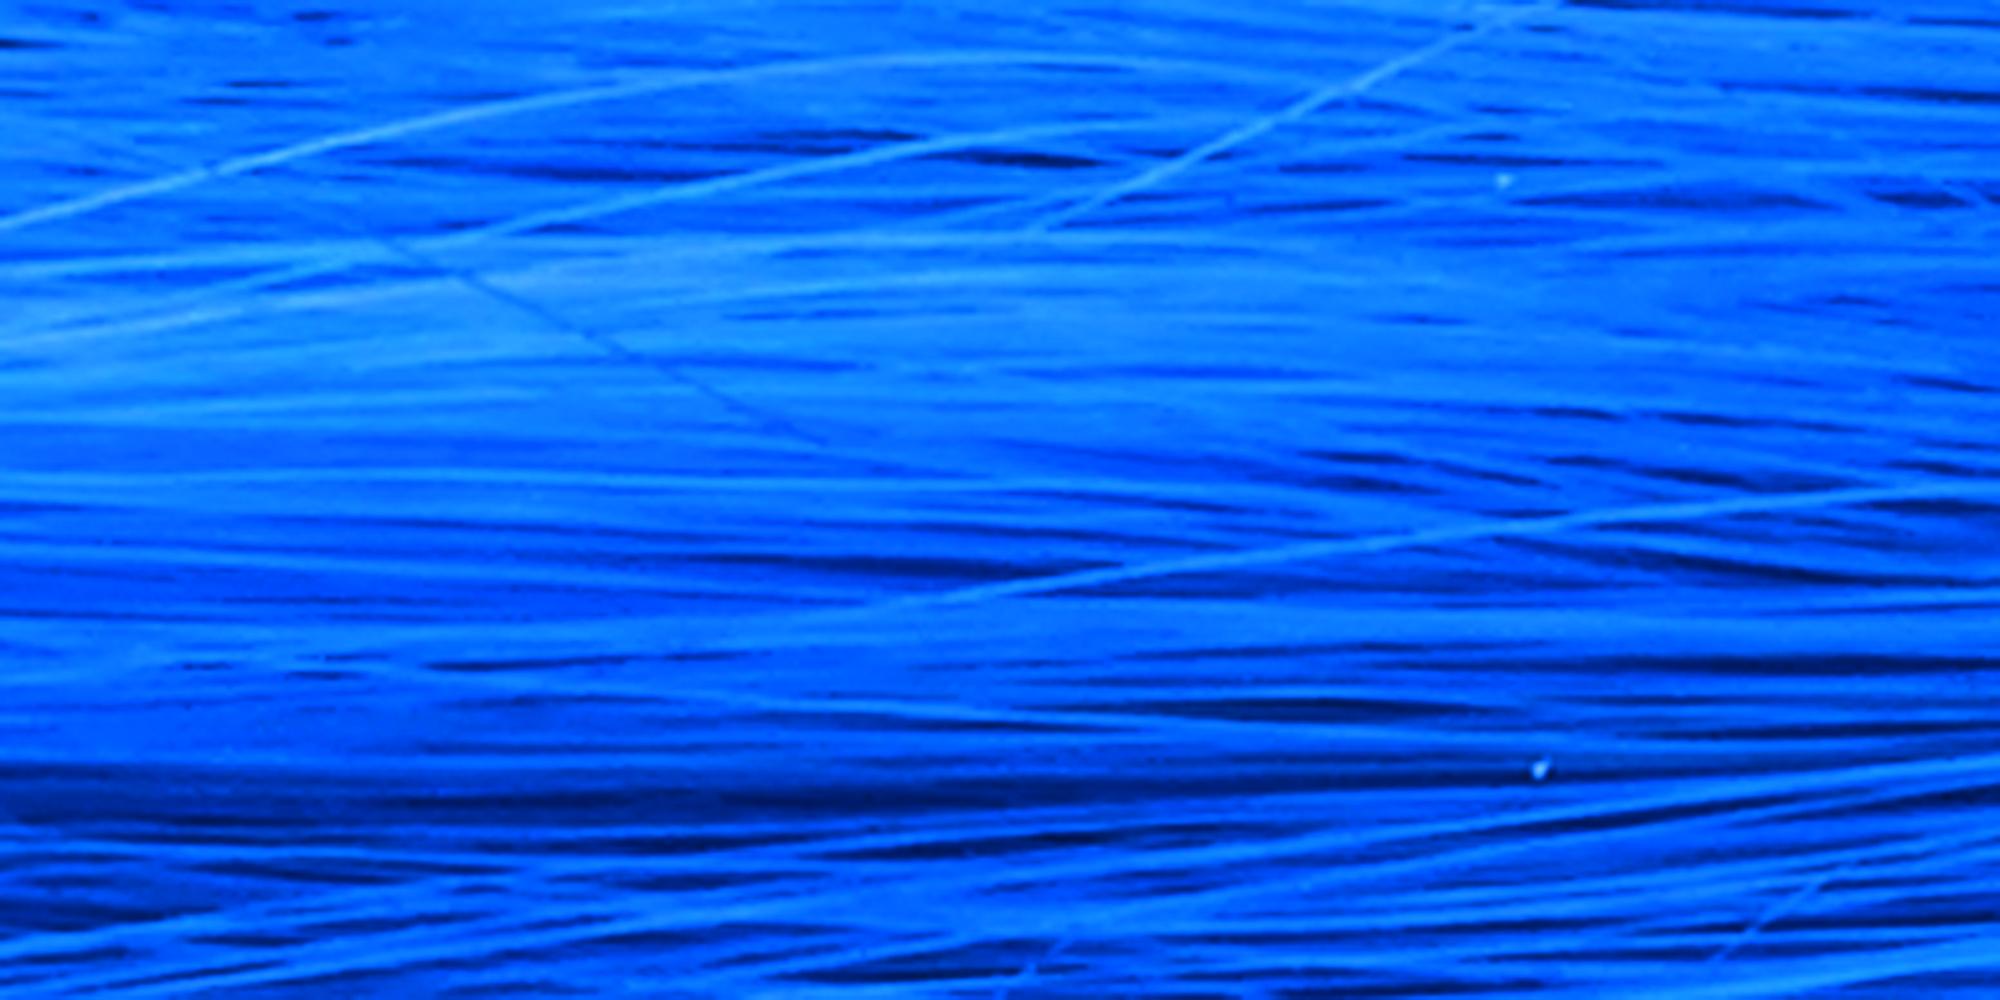 Stargazer-Baby-Hair-Extension-Synthetic-Clip-on-Streak-Various-Colors-43cm thumbnail 12